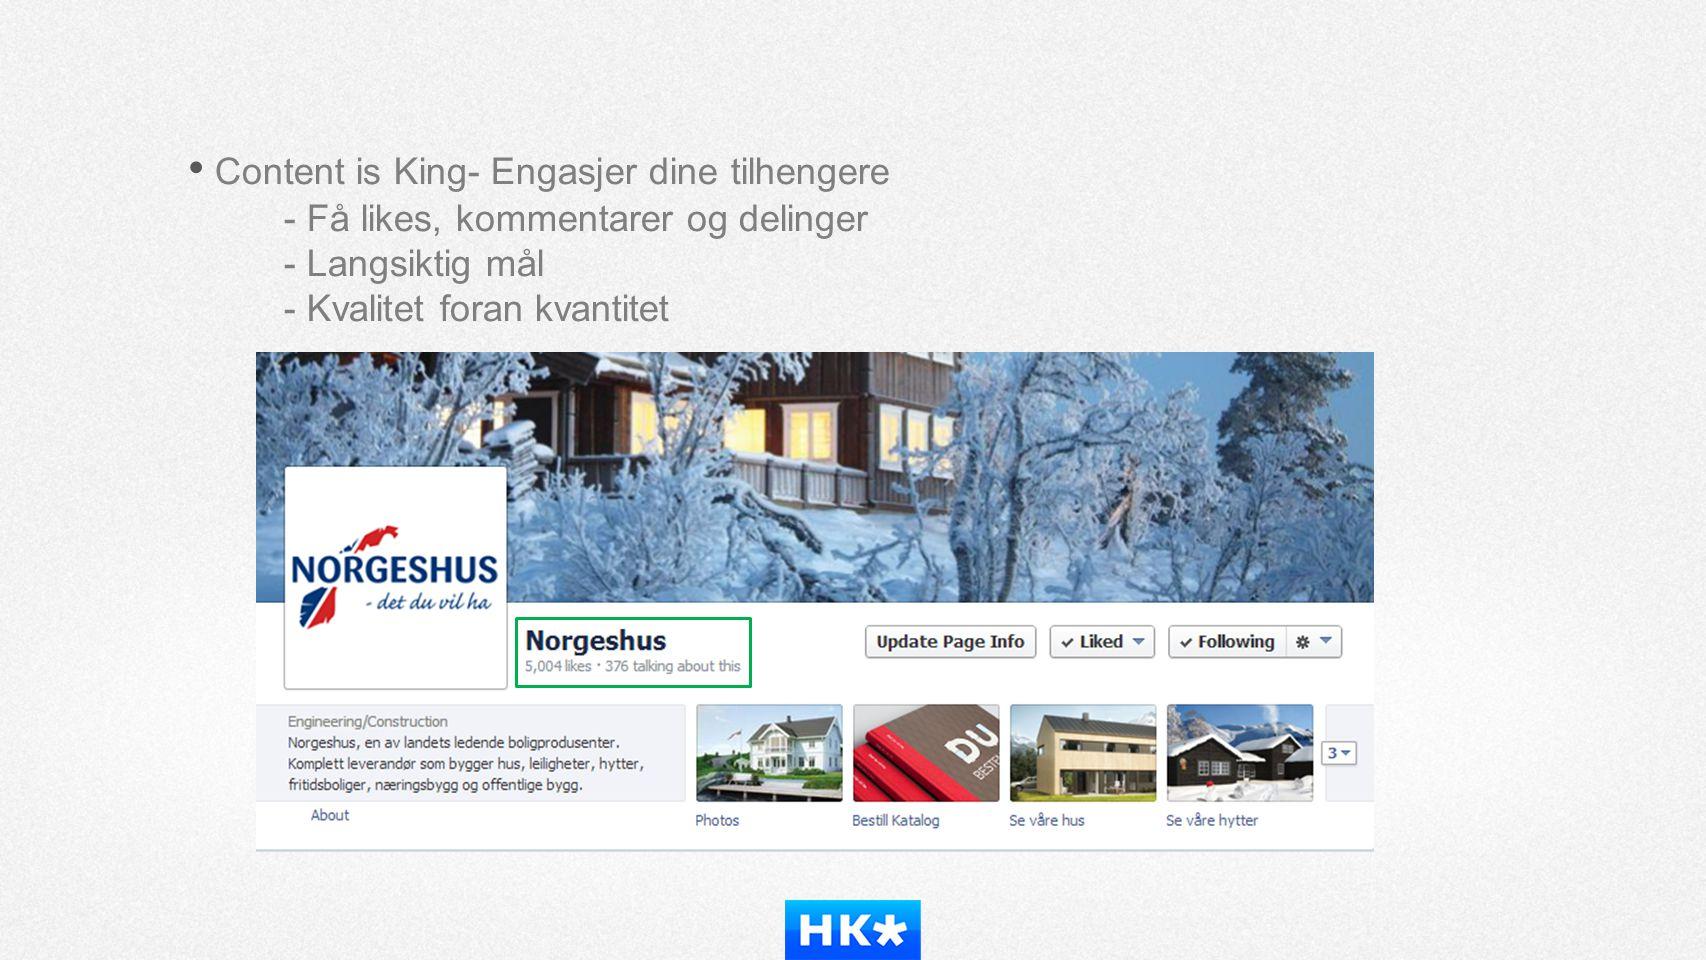 • Content is King- Engasjer dine tilhengere